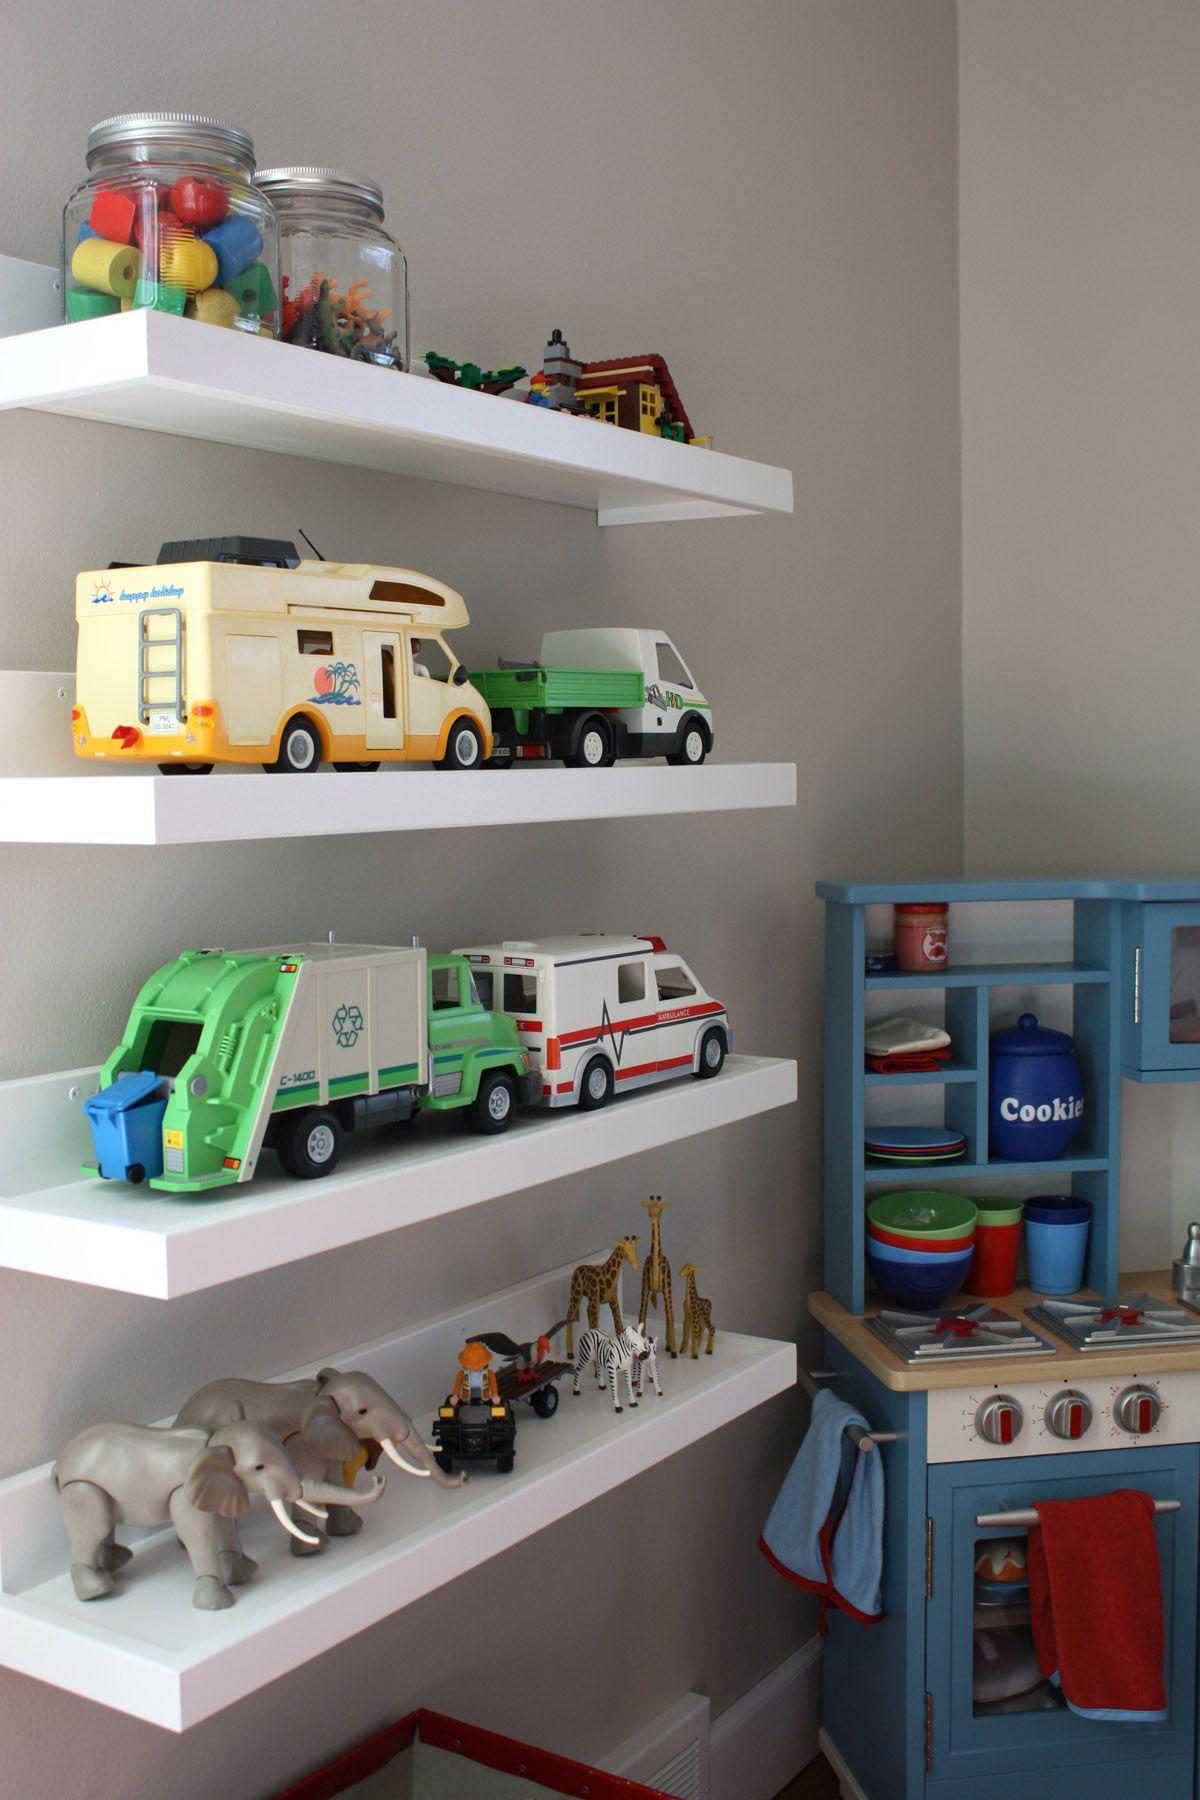 Playmobil vehicle shelving playmobil pinterest - Rangement pour playmobil ...